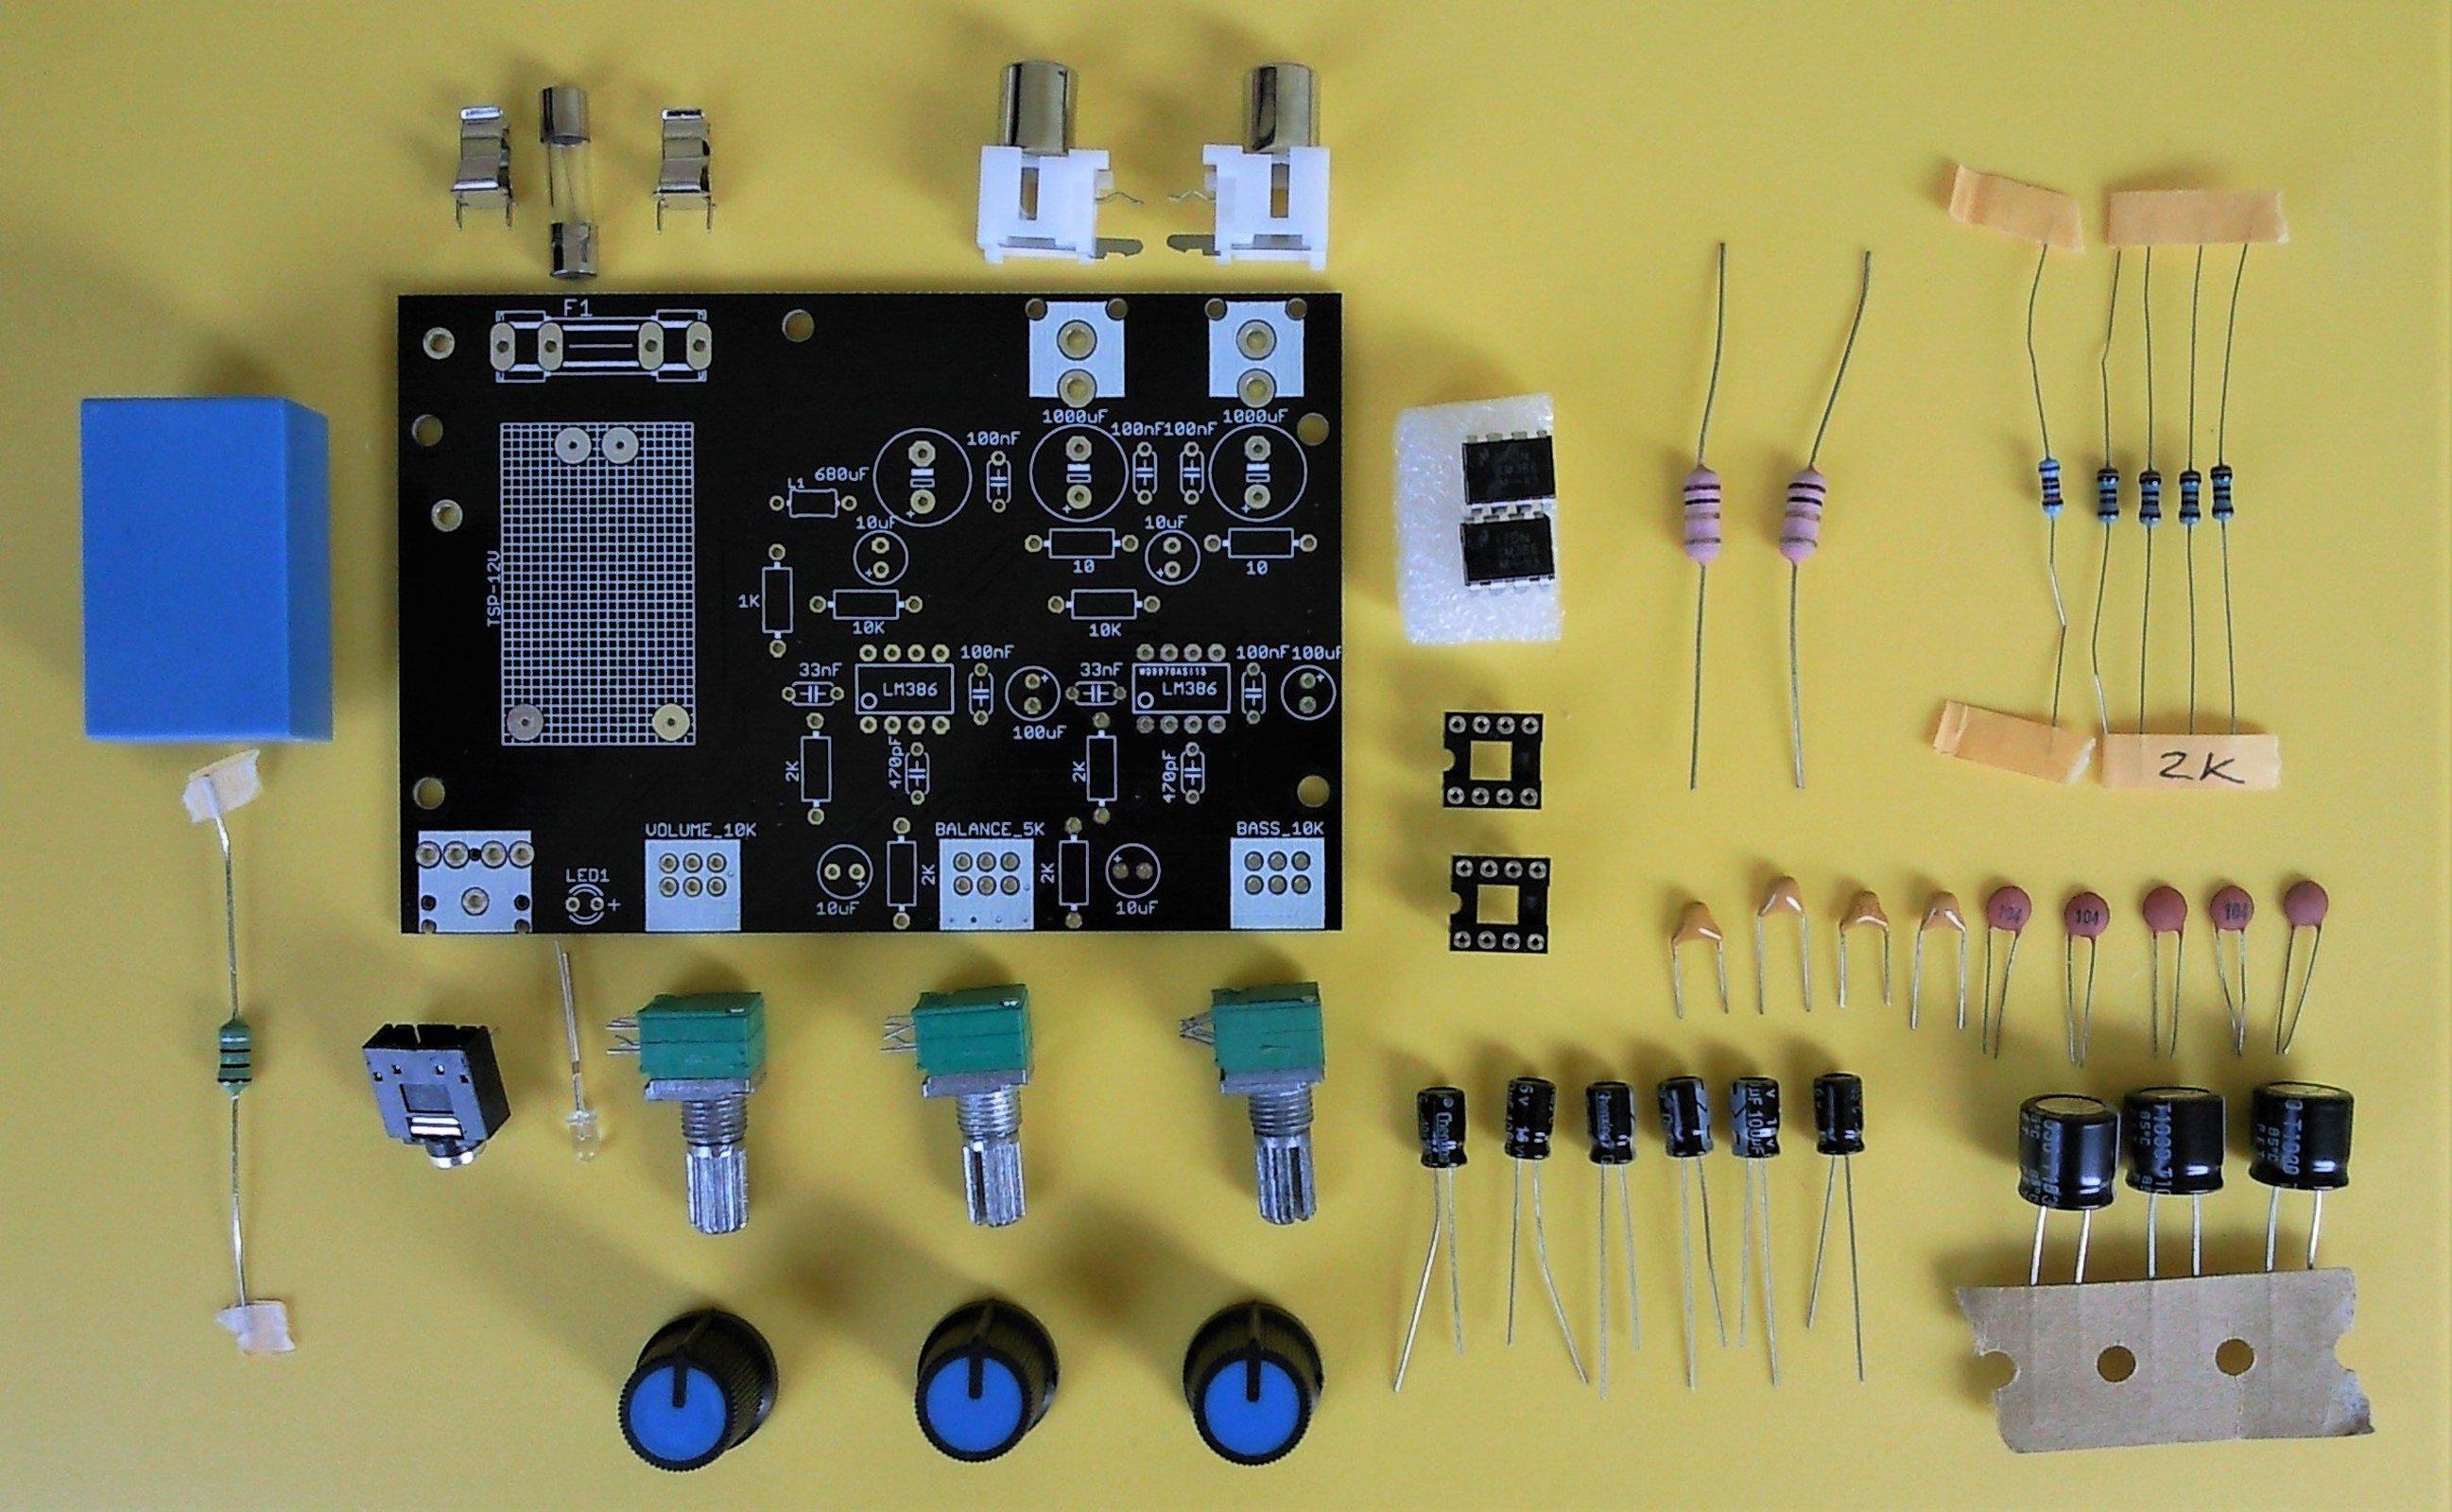 Diy Stereo Amplifier Home Design 30 Watt Circuit Gadgetronicx Lm386 With Bass Boosting Kit 1